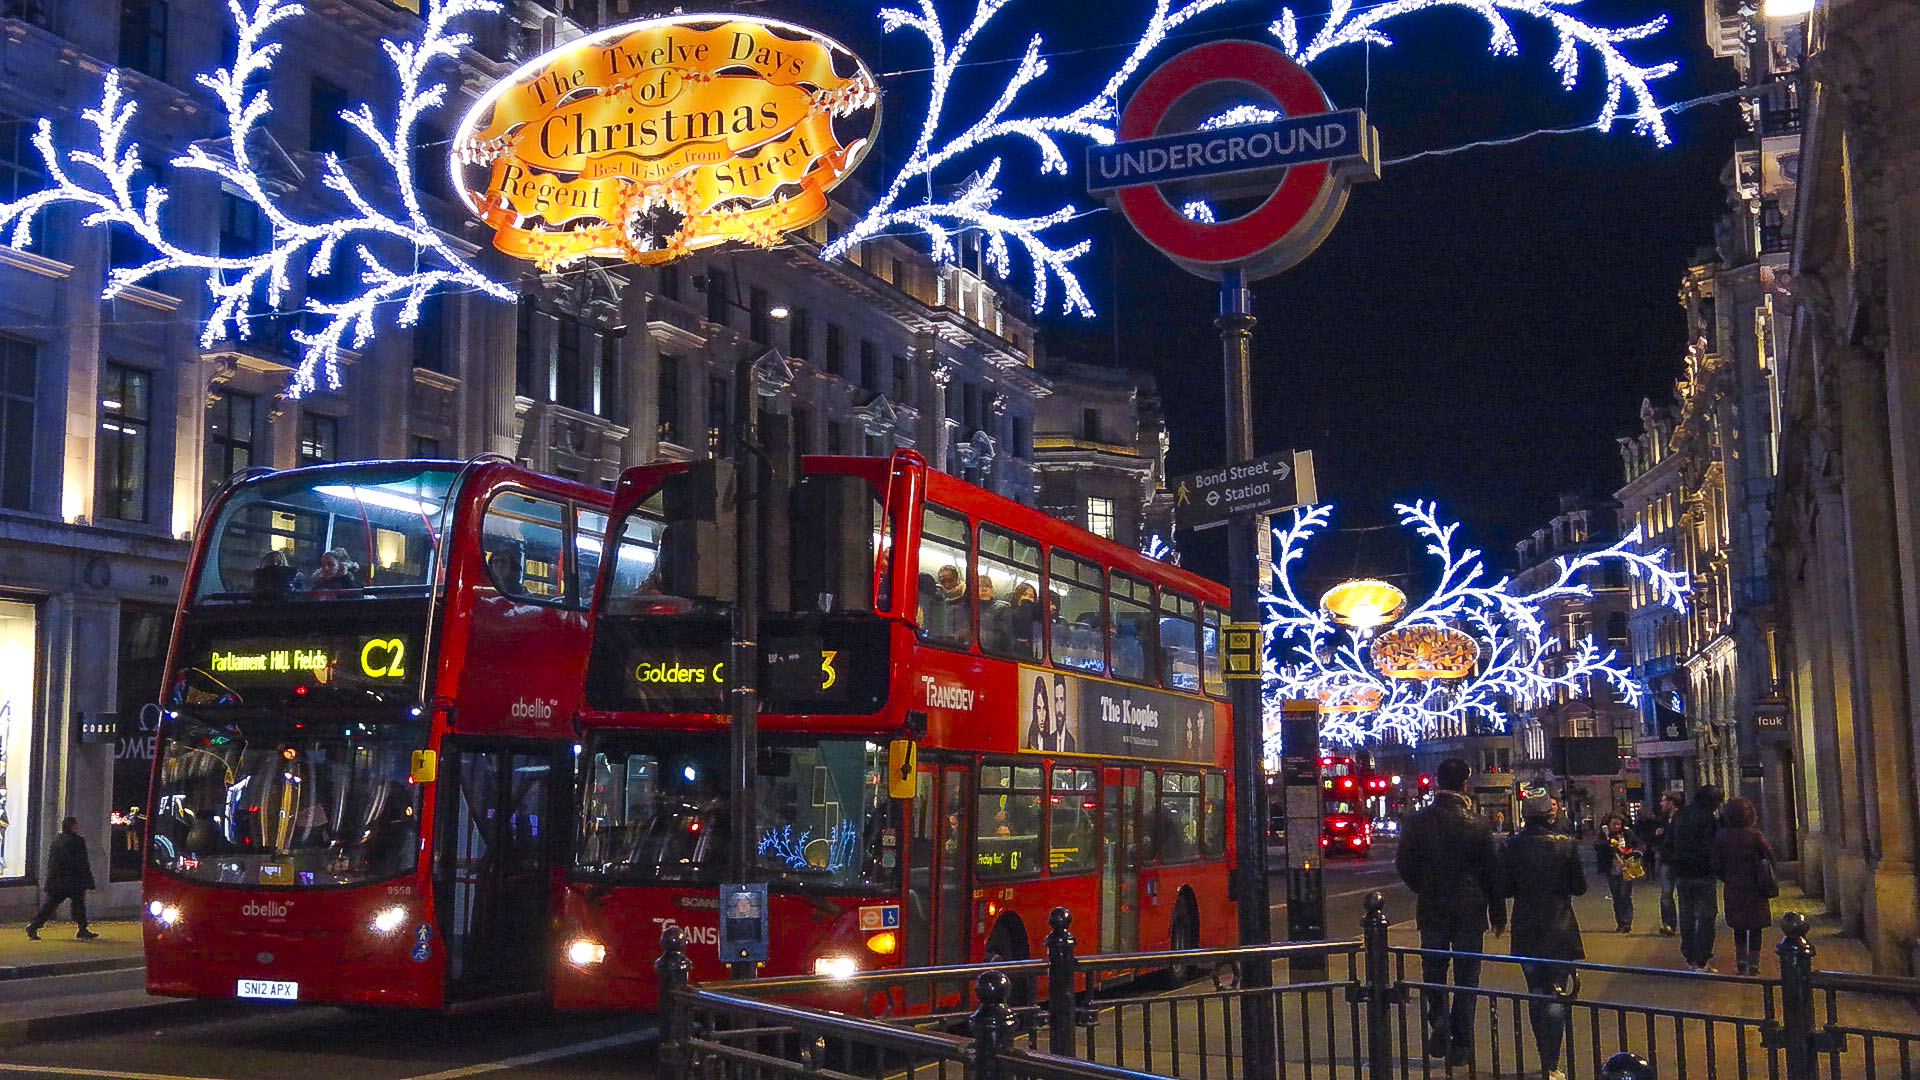 «Navidad en Londres». Fuente: http://merychrist-mas.blogspot.com/